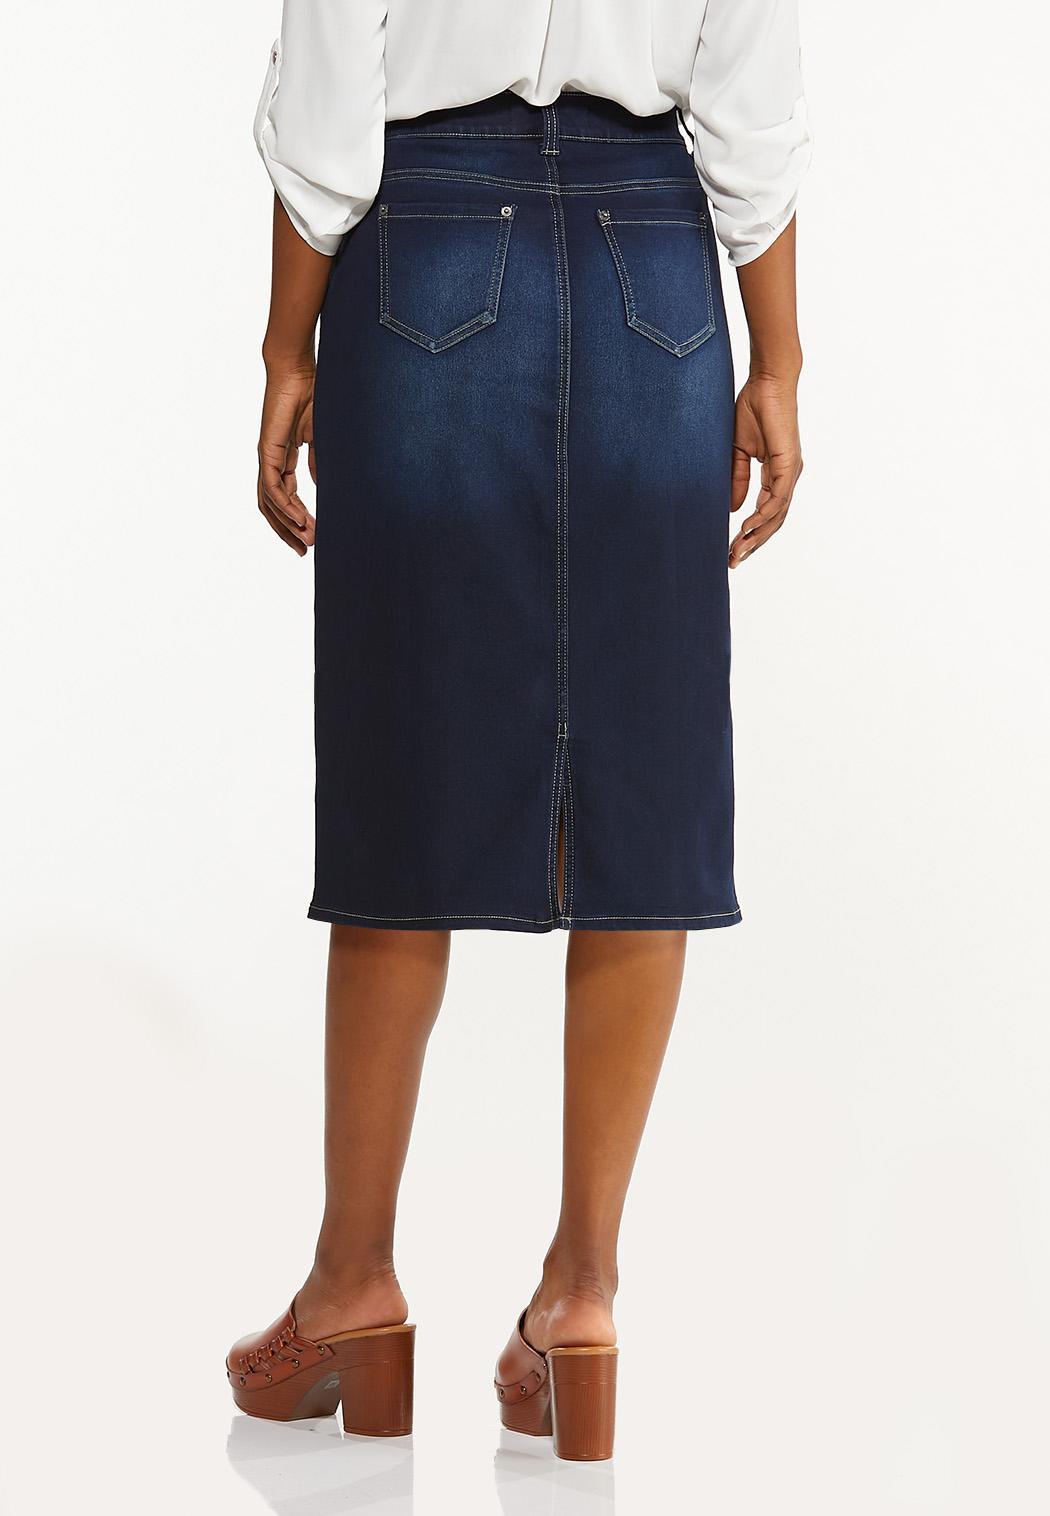 Plus Size Classic Dark Wash Denim Skirt (Item #44506420)